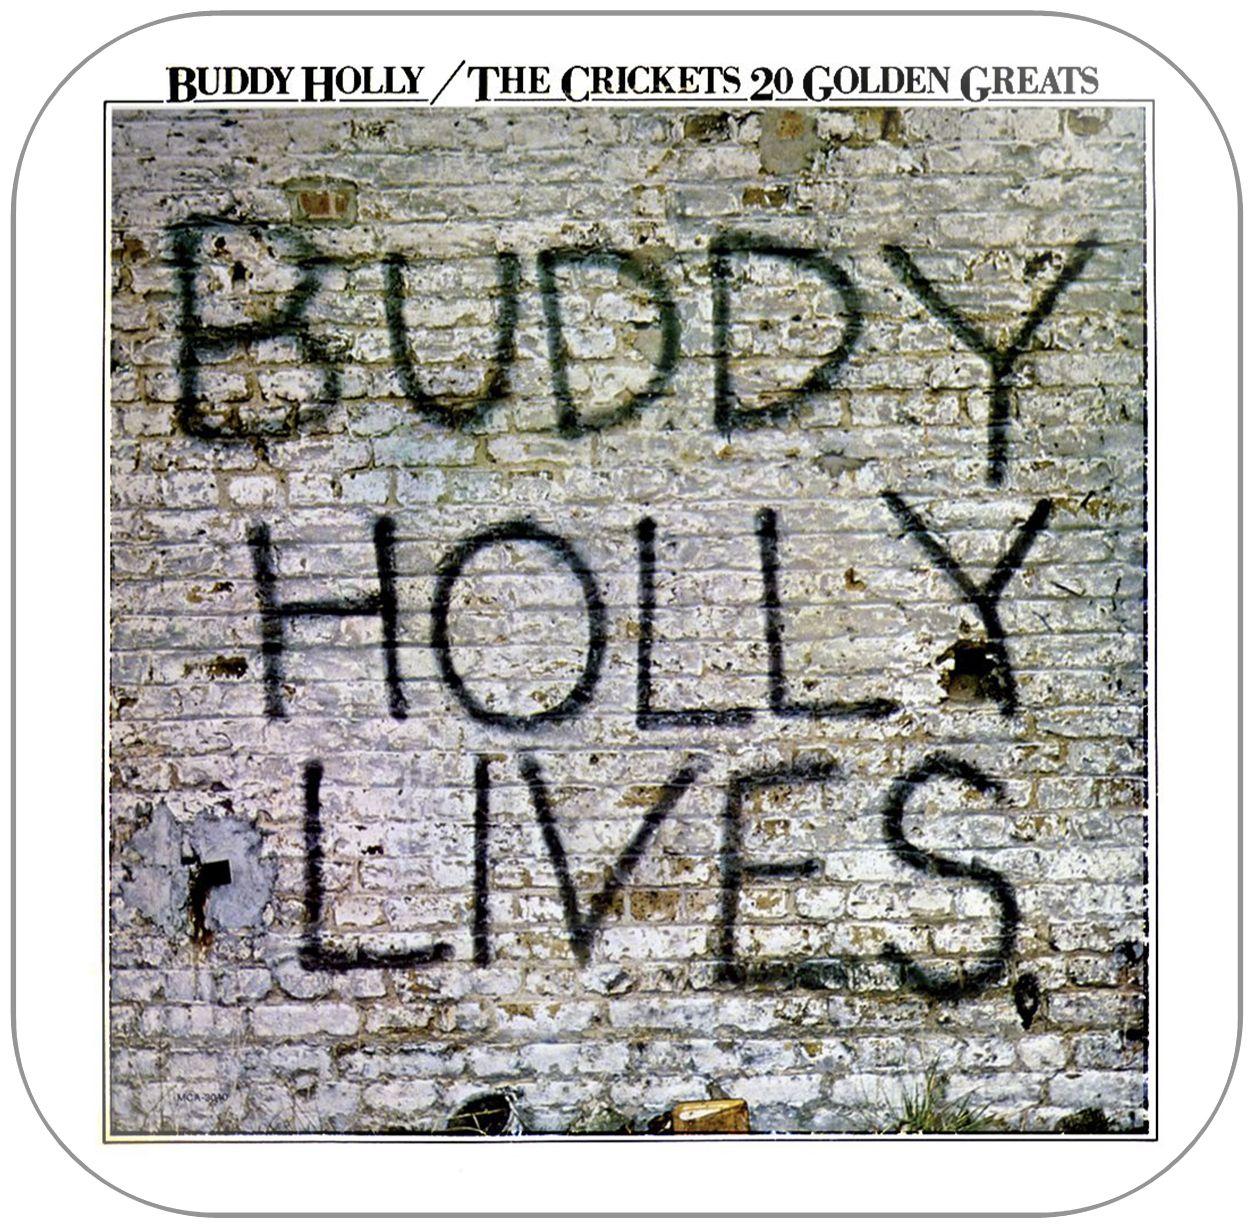 Buddy Holly And The Crickets 20 Golden Greats Album Cover Sticker Vinile Citazioni